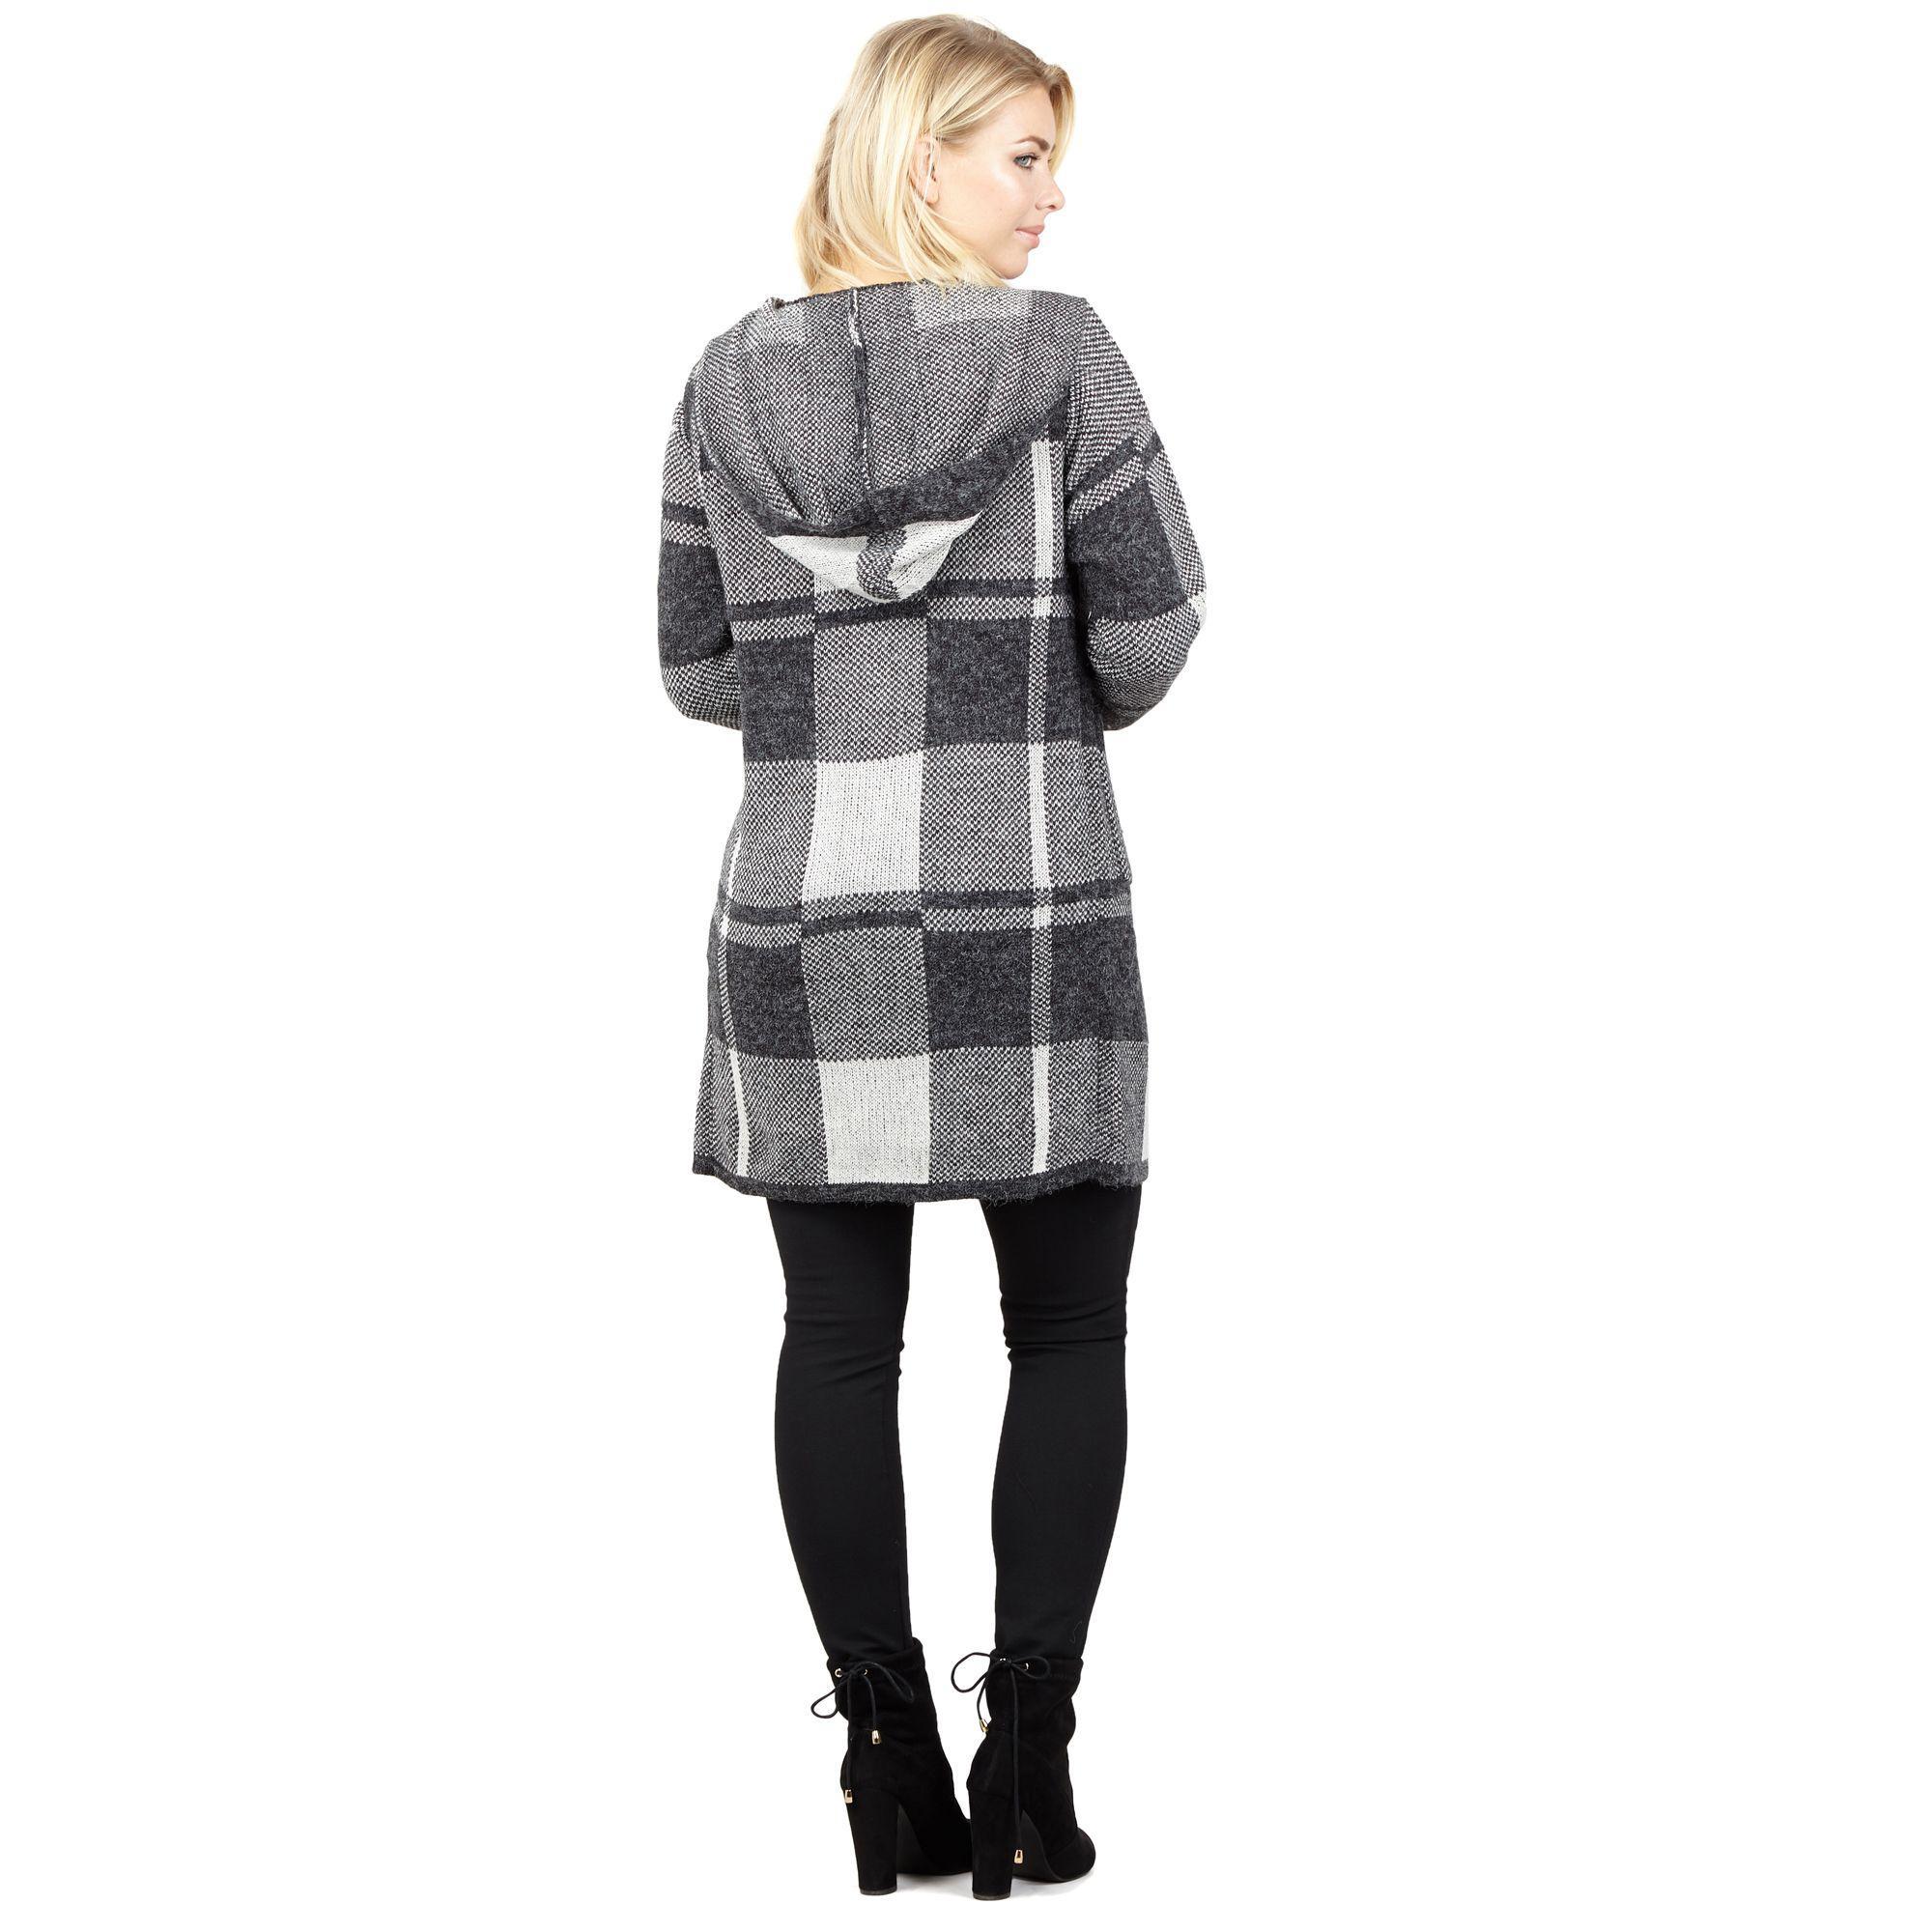 47e60a32d22 Izabel London Grey Patchwork Knit Cardigan in Gray - Lyst